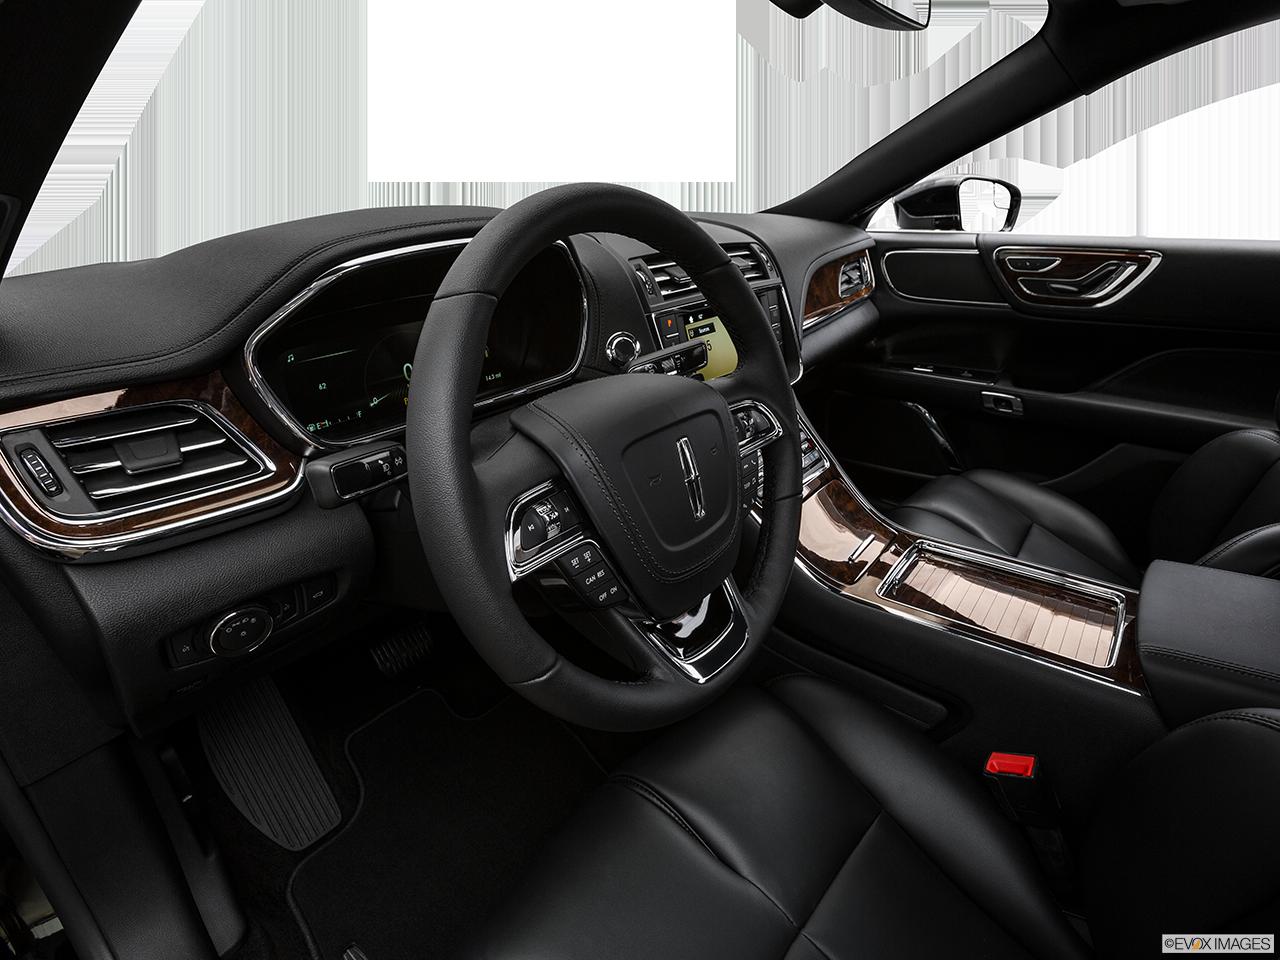 2019 Lincoln Continental photo